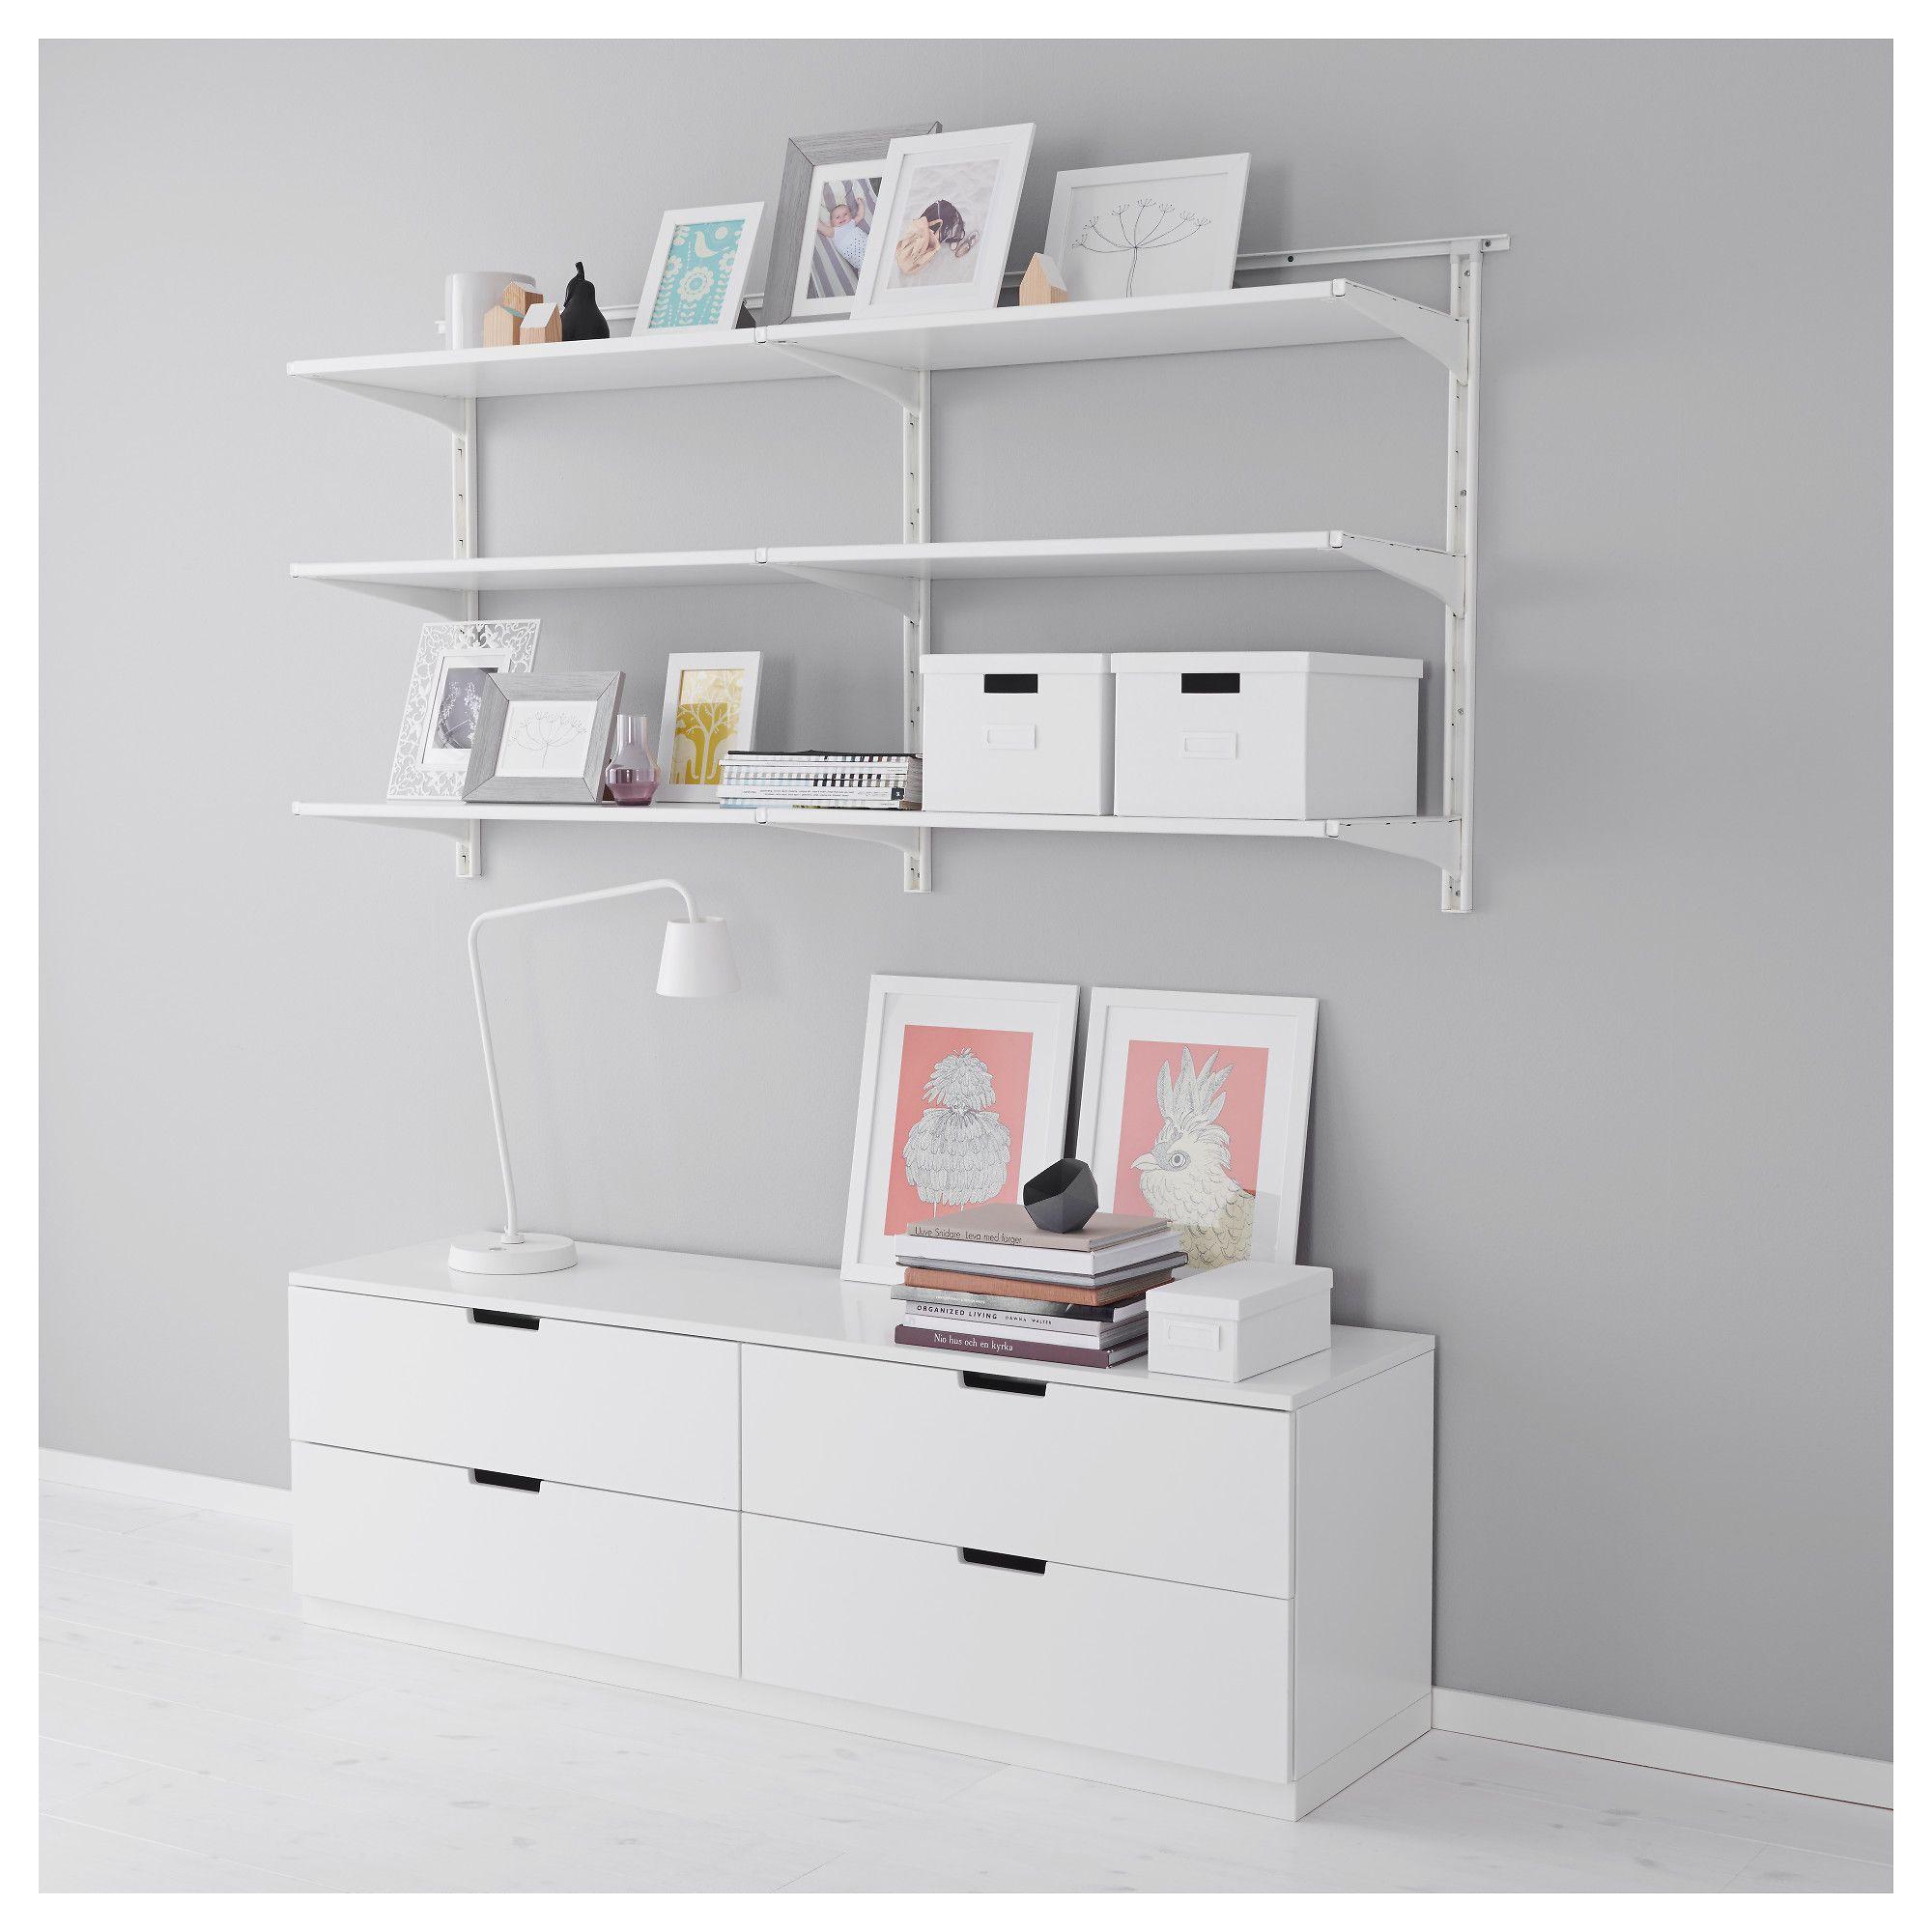 Ikea Algot White Wall Upright Shelves Wall Bookshelves Ikea